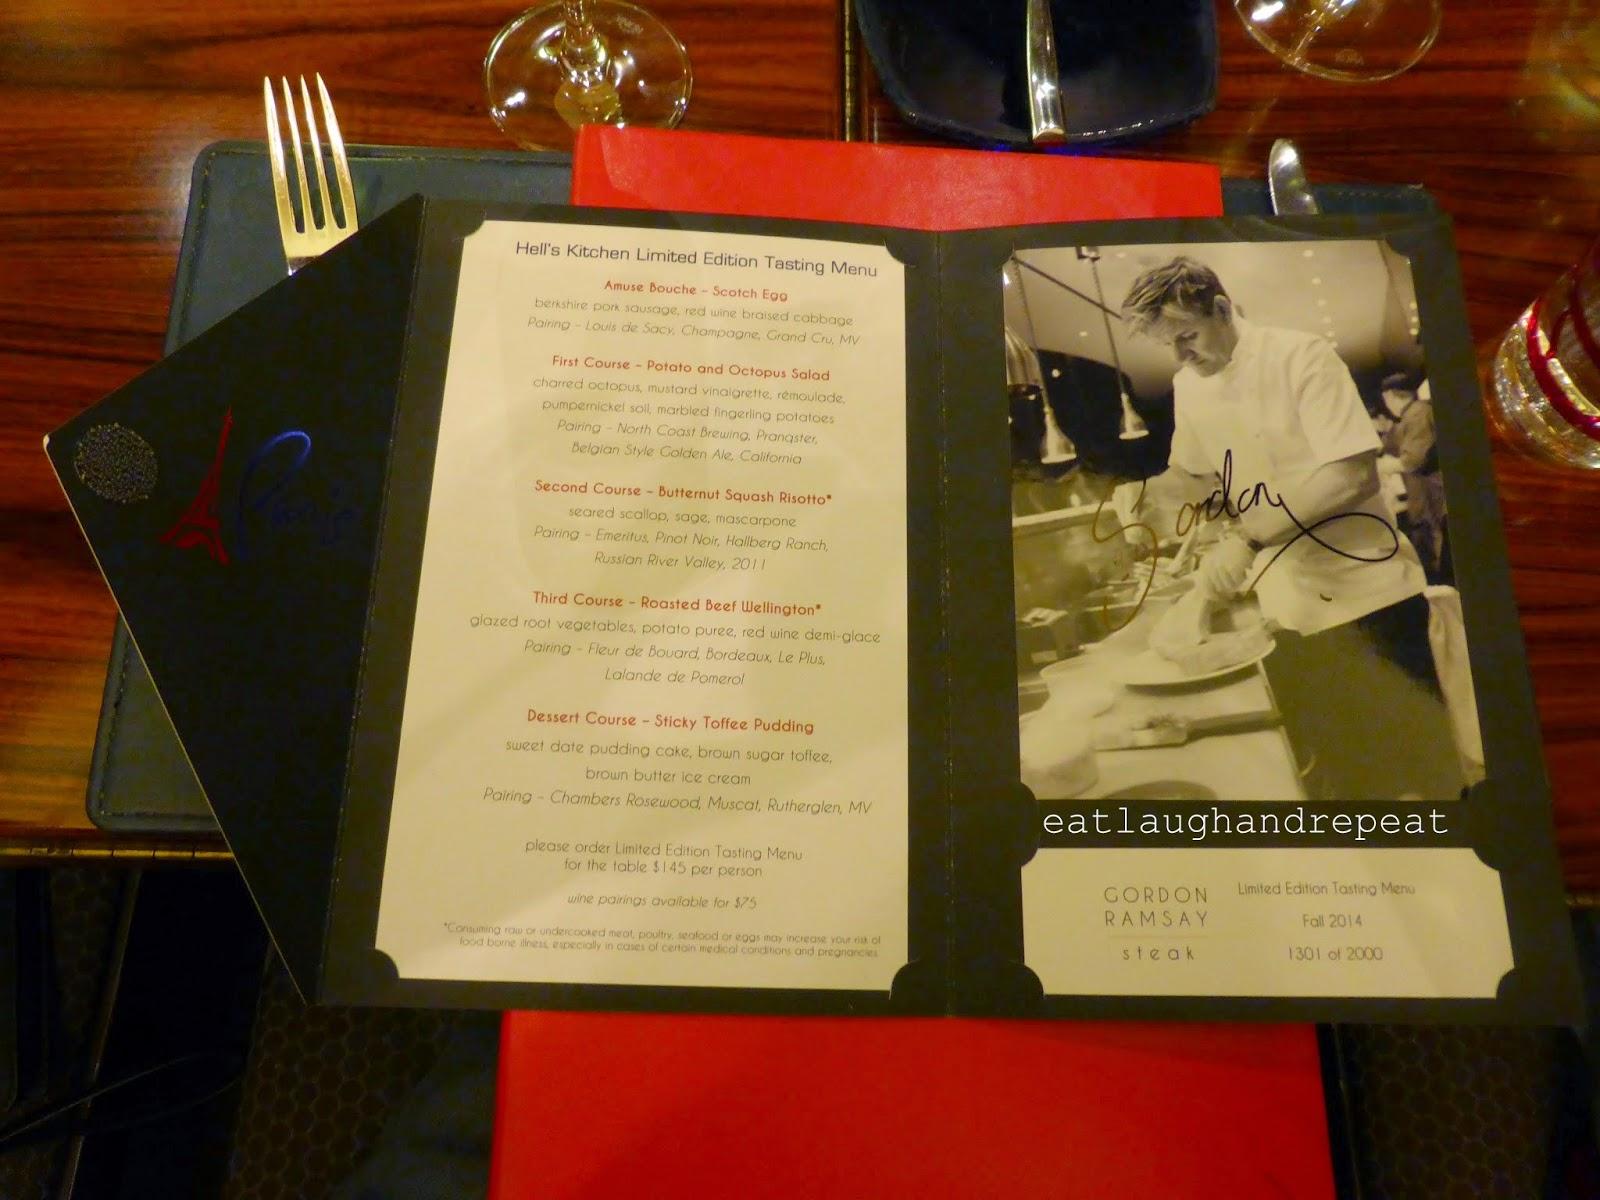 EatLaughandRepeat: Gordon Ramsay Steak